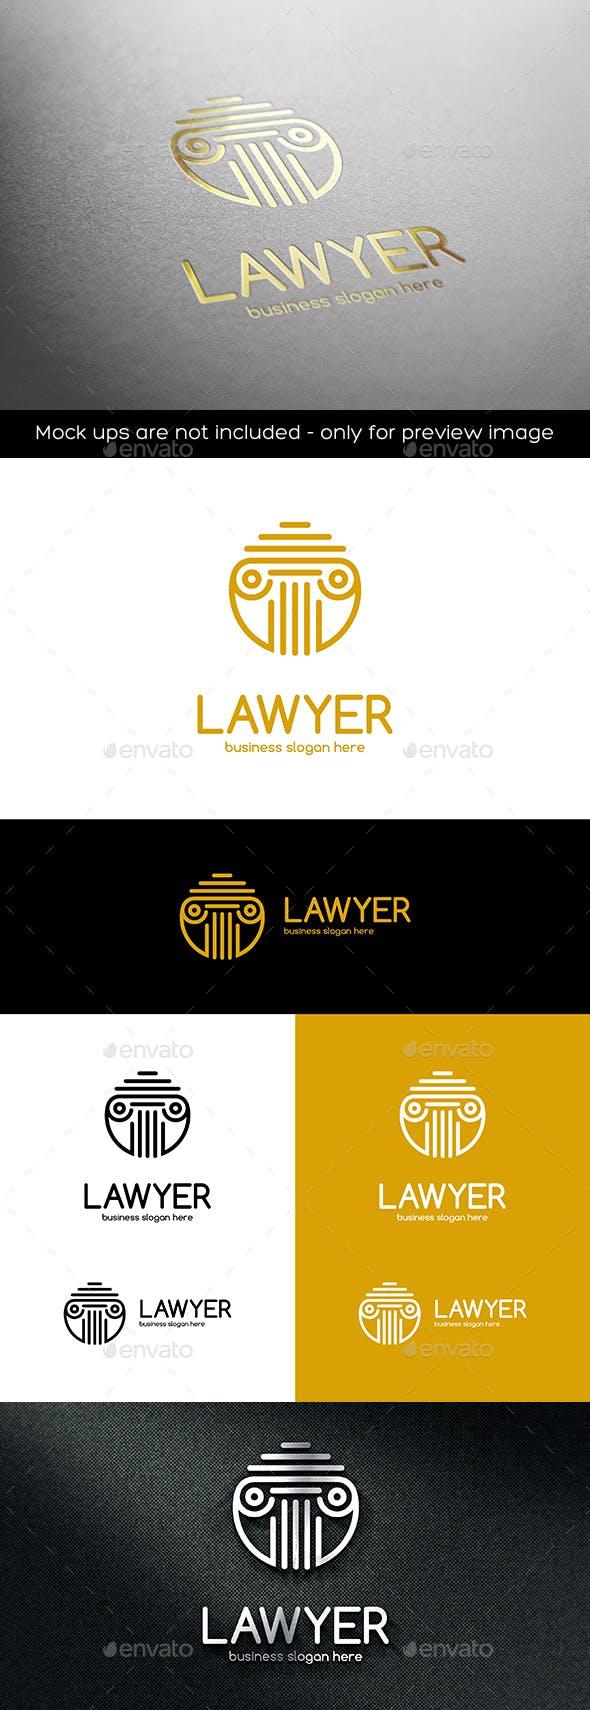 Дизайн логотипа Адвоката юриста для визитки